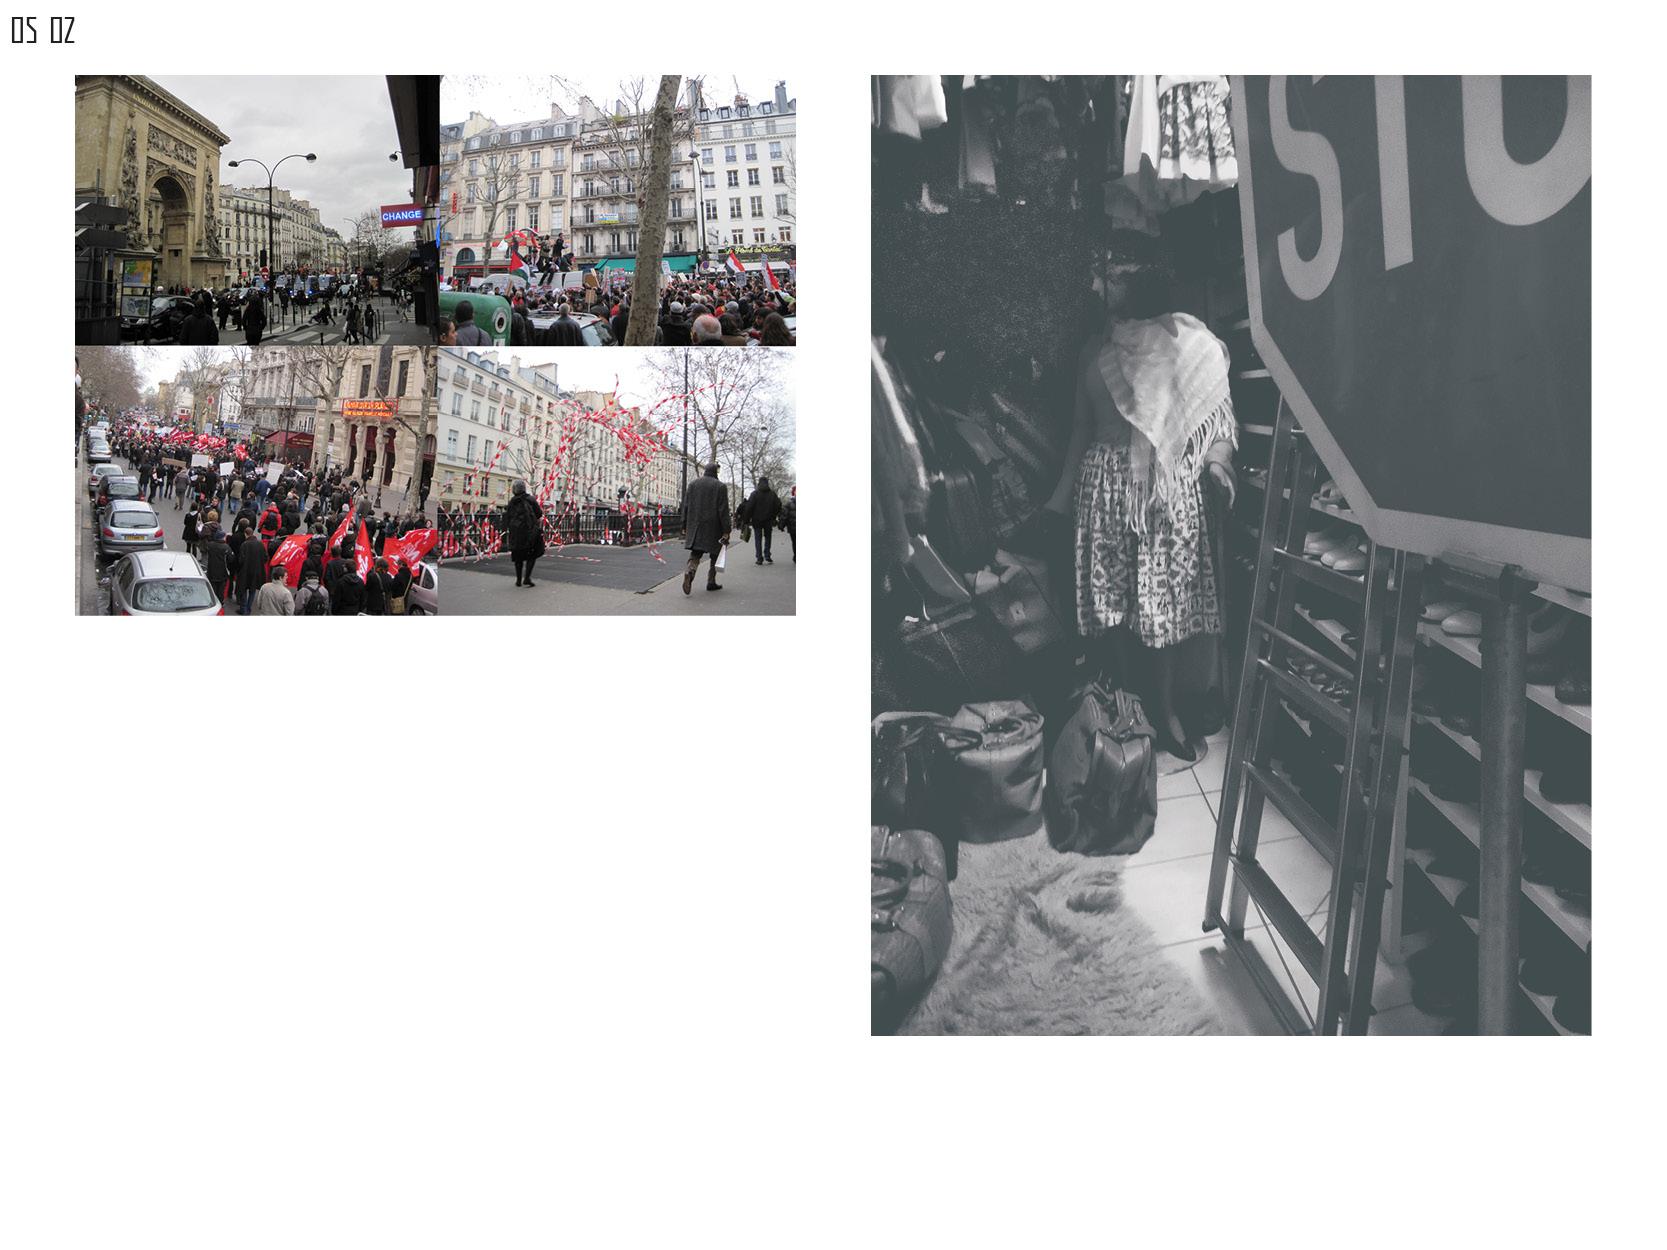 Gerrit-Schweiger-Dialog-Städte-Paris-Berlin-Jessica-Blank-Experiment-Fotoserie-Tagebuch-visuelle-Kommunikation-96